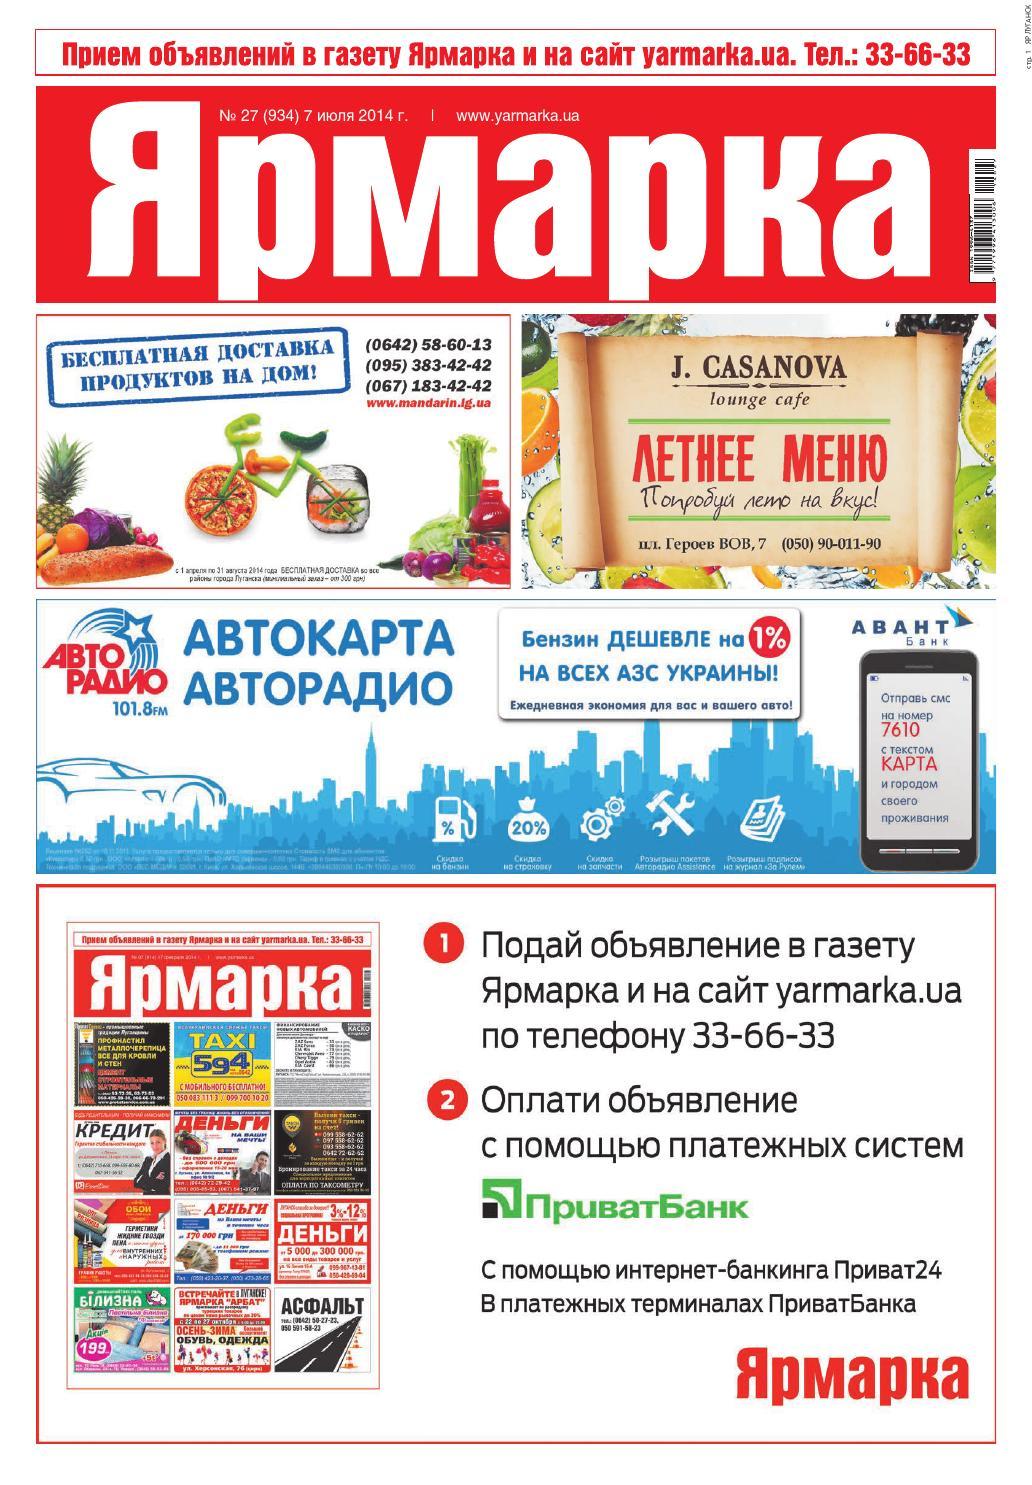 291e7d6d3e8 Yarmarka lugansk 07 07 2014 by besplatka ukraine - issuu